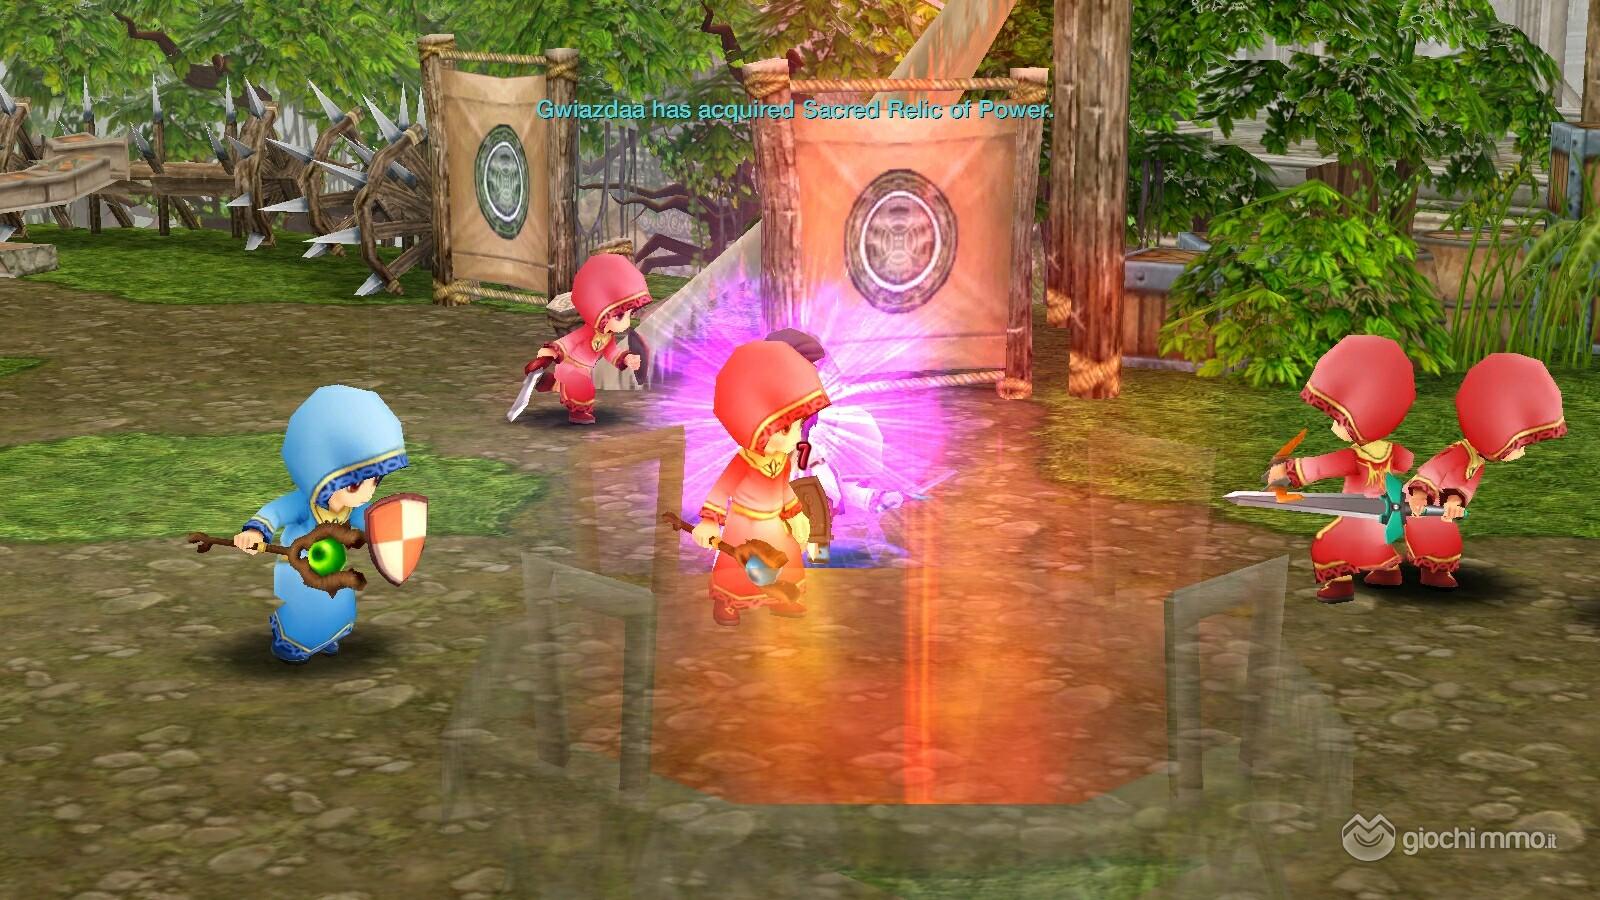 Clicca sull'immagine per ingrandirlaNome:   Legend of edda screen09.jpgVisite: 59Dimensione:   429.1 KBID: 8523